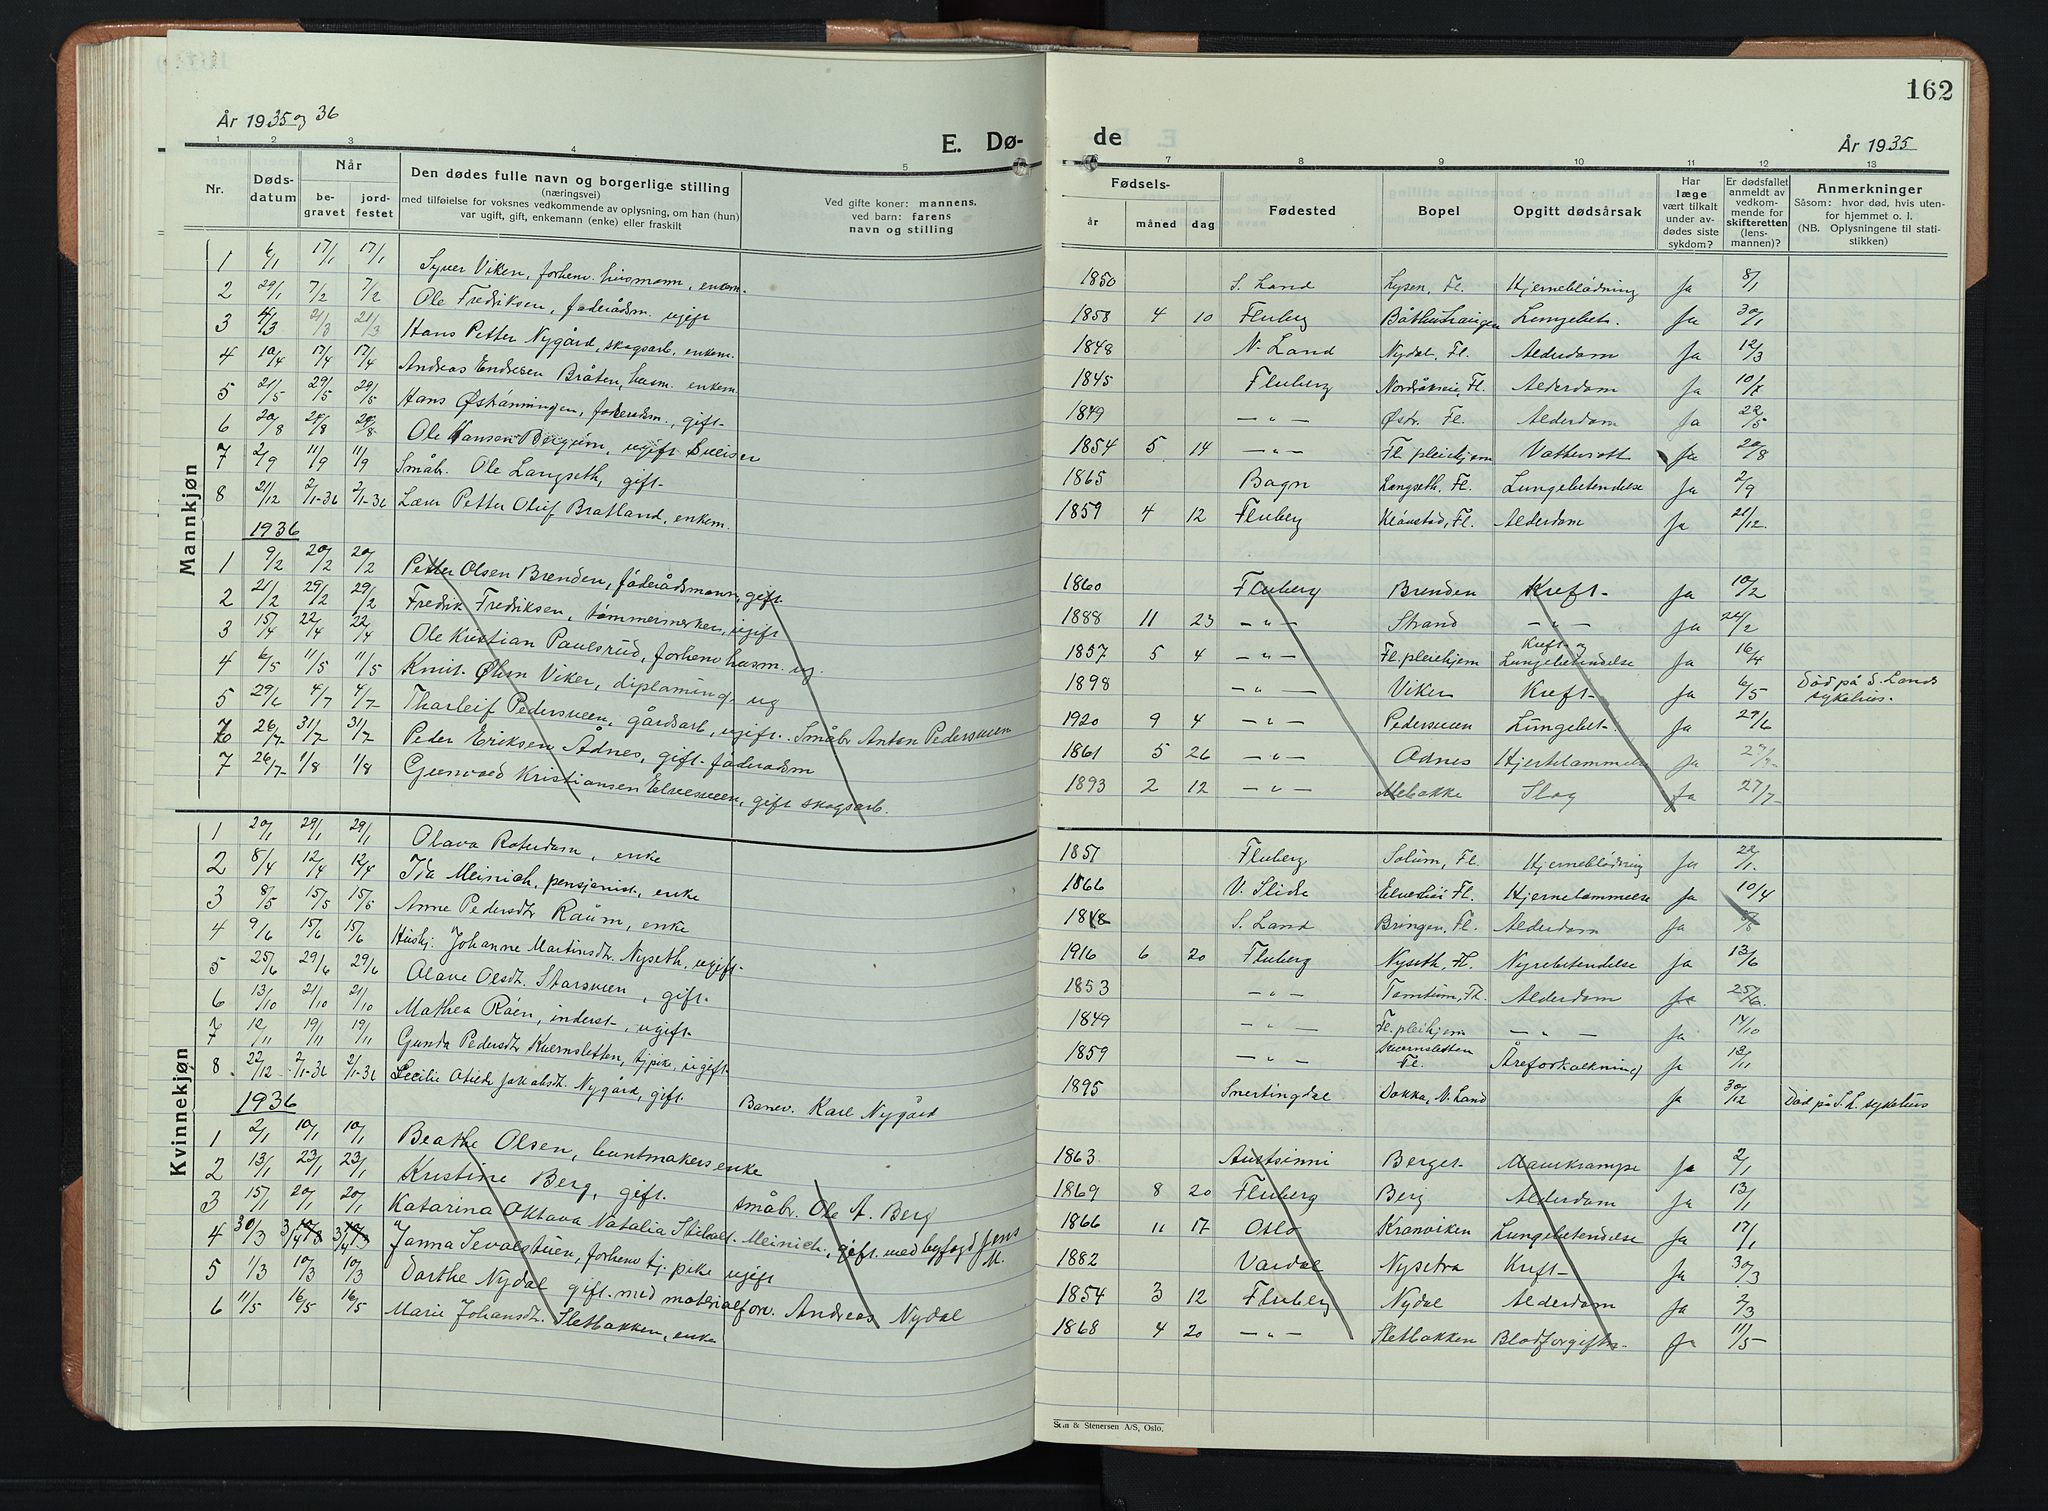 SAH, Søndre Land prestekontor, L/L0008: Klokkerbok nr. 8, 1926-1950, s. 162